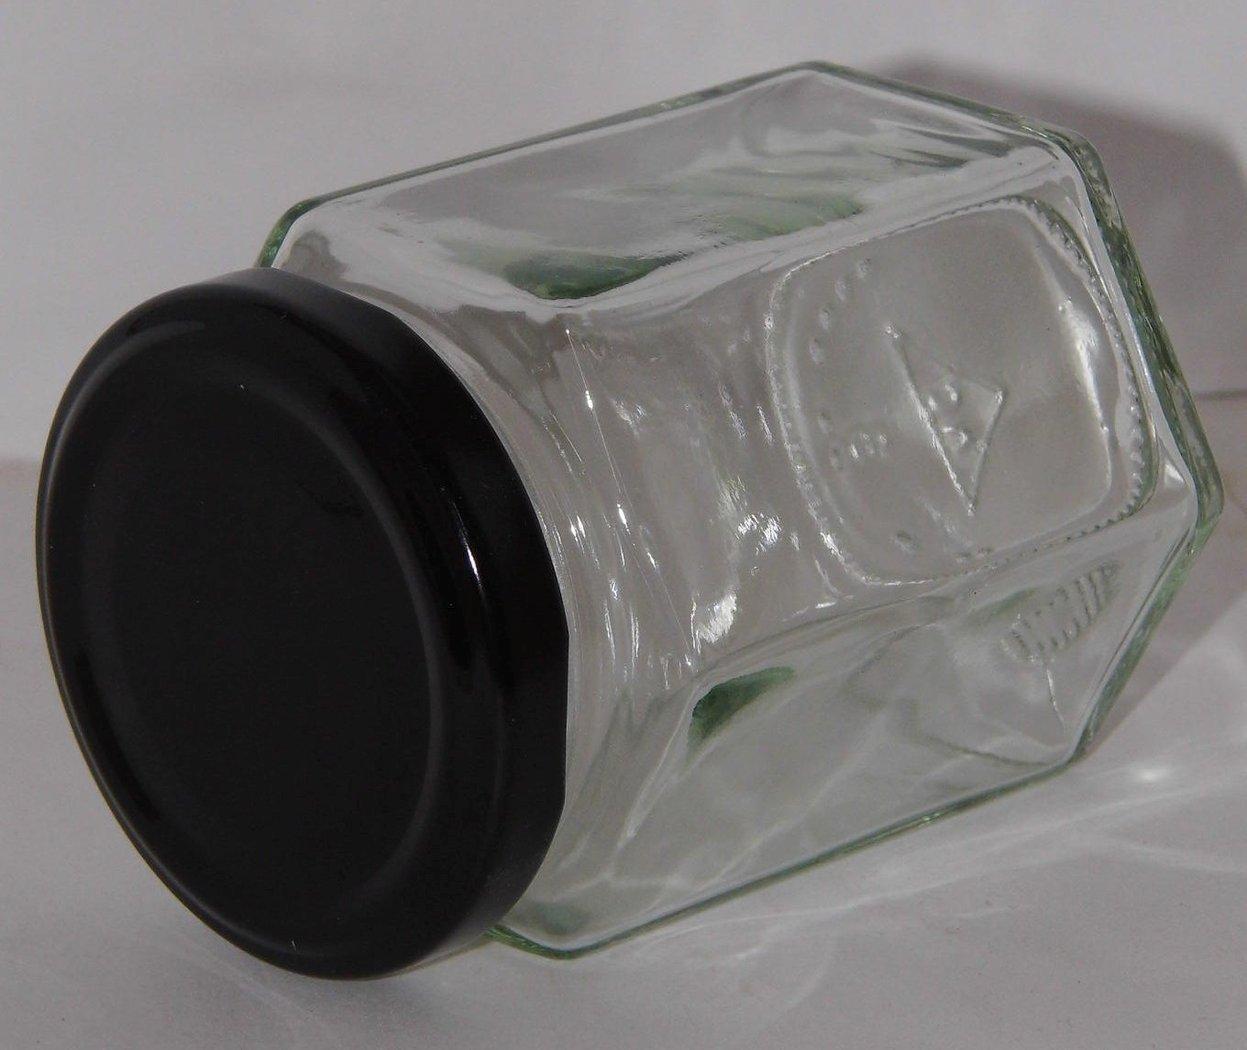 Gewürzglas 196ml 6-eckig m. schwarzen Deckel